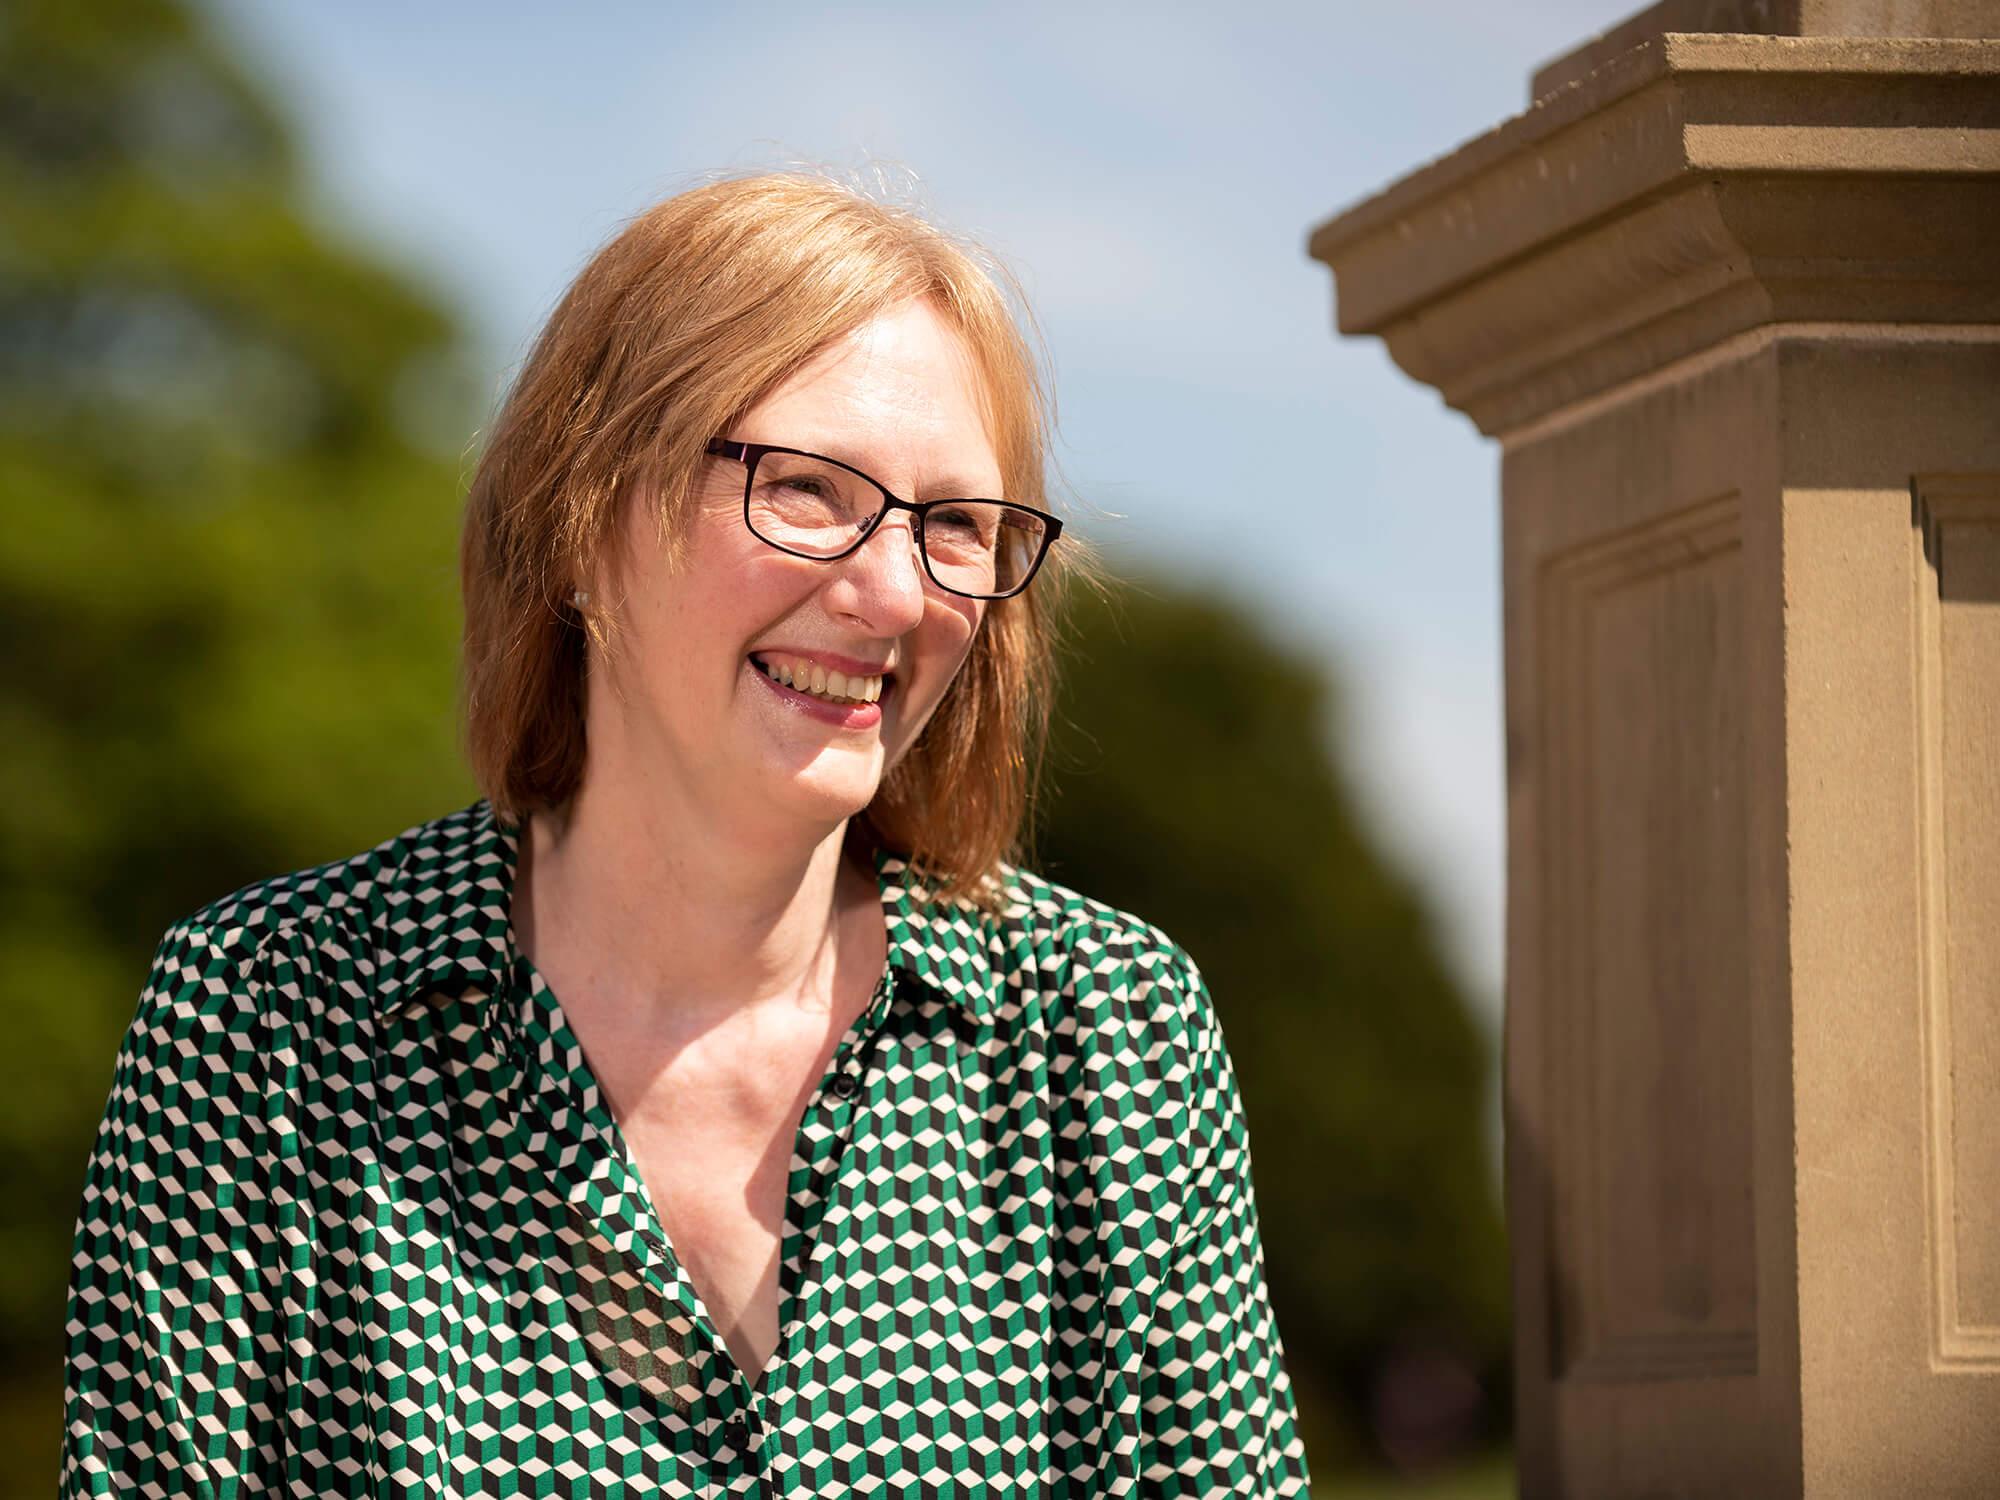 MA student Jill Baker